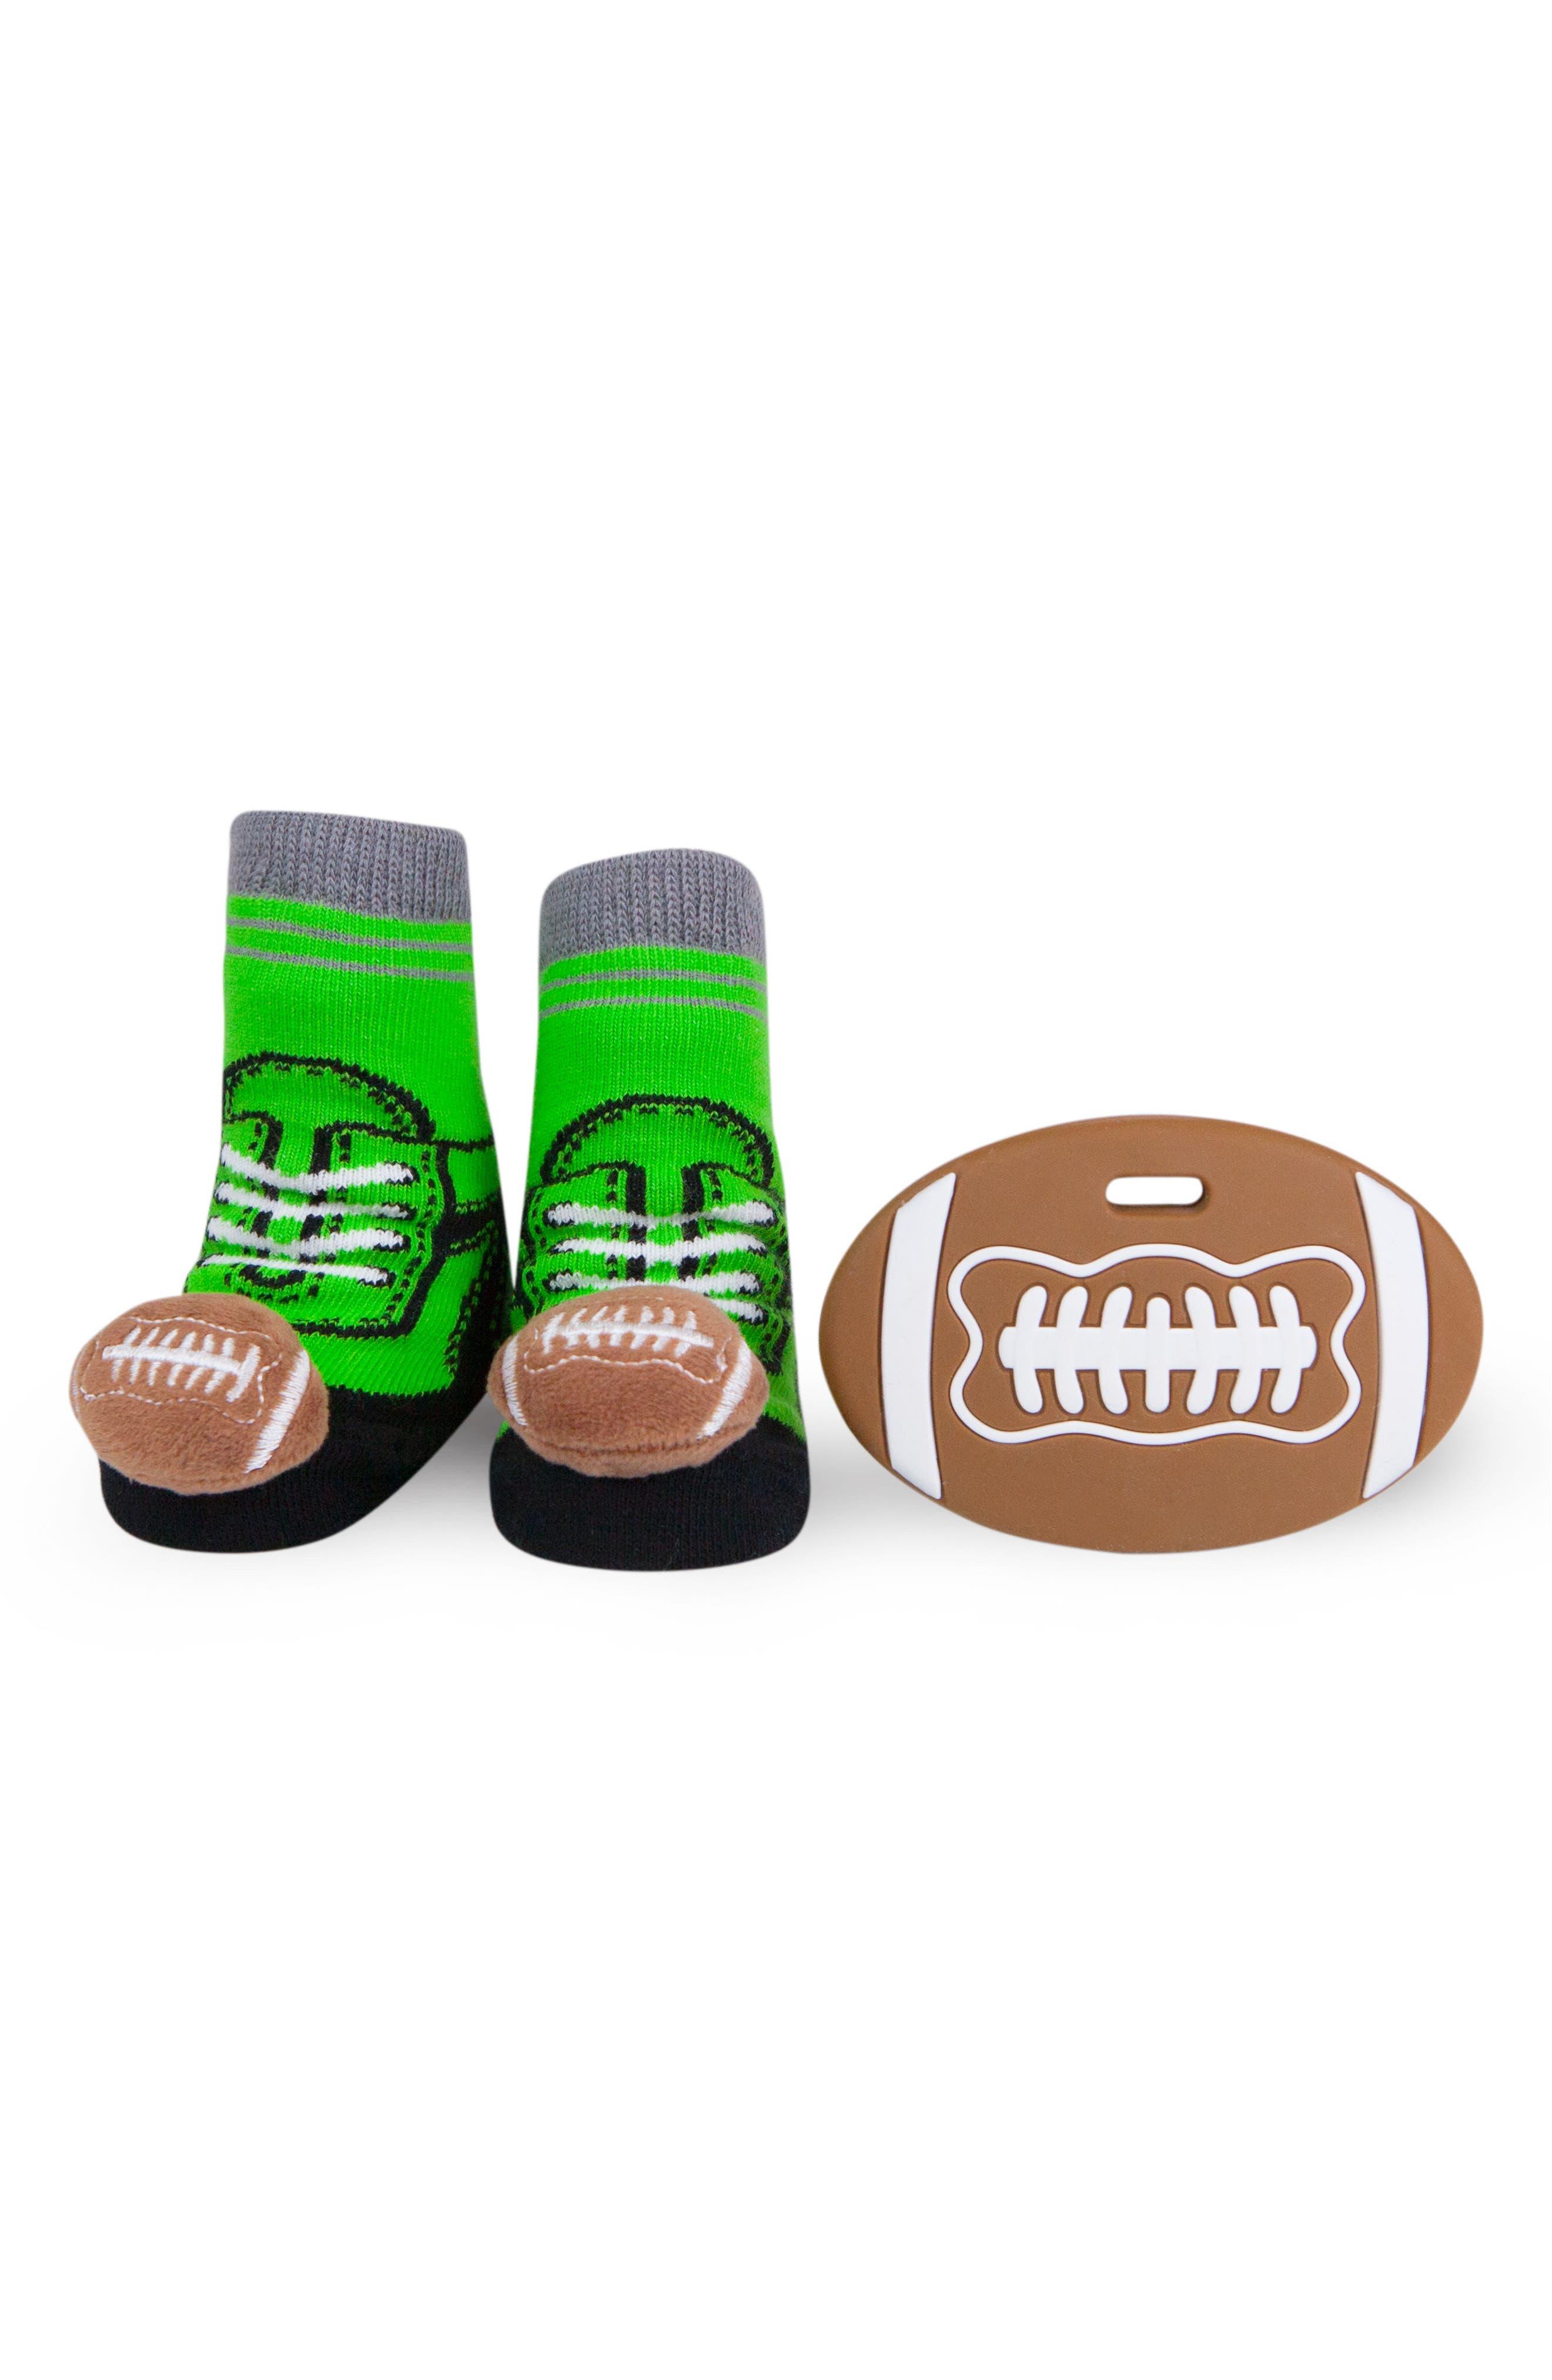 Football Rattle Socks & Teether Gift Set,                         Main,                         color, Brown